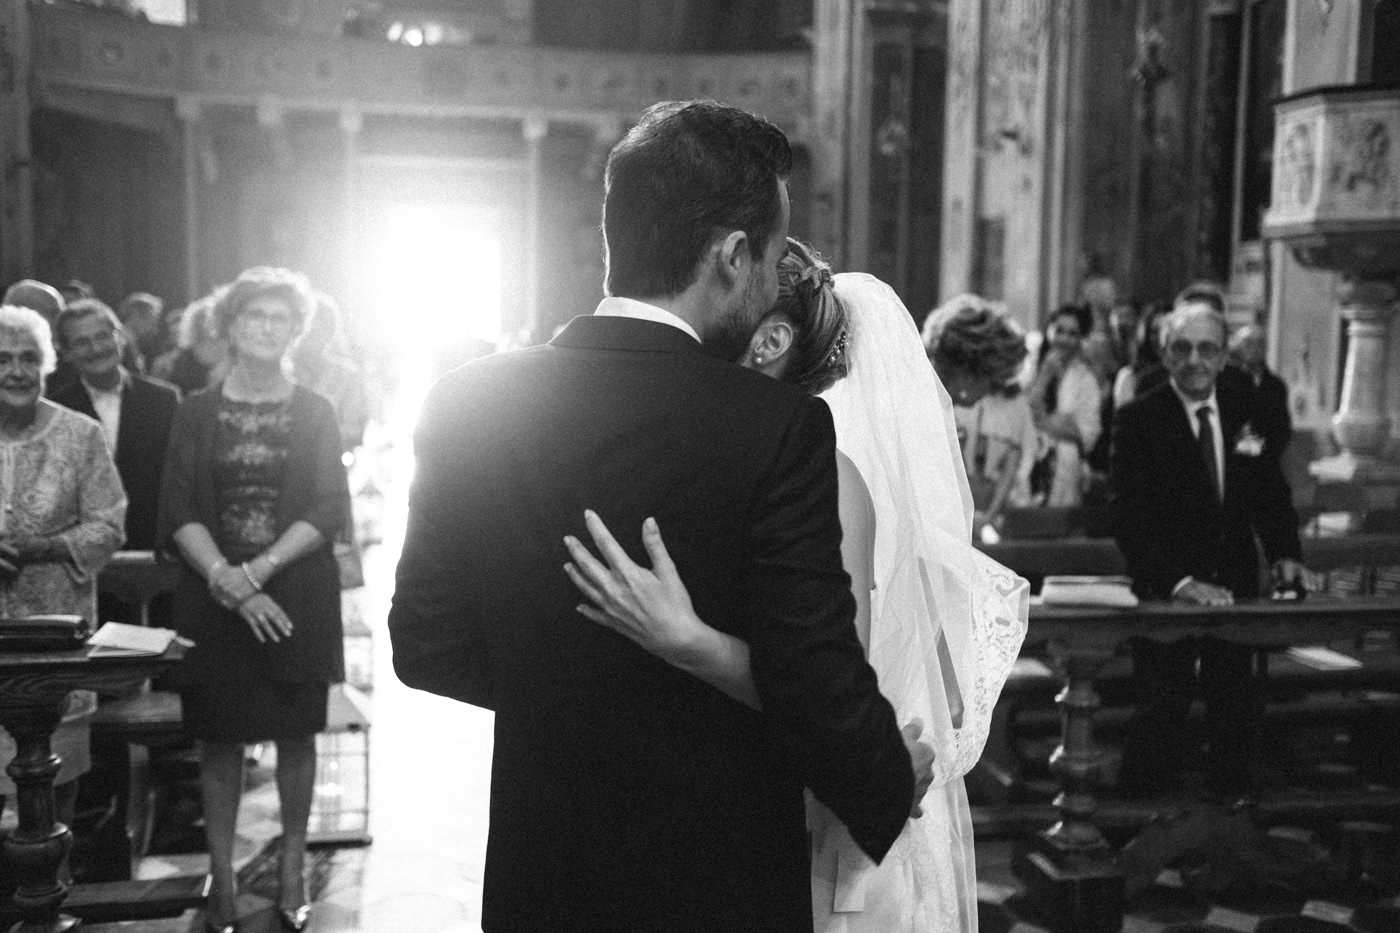 matrimoni_all_italiana_fotografo_matrimonio_cinque_terre-28.jpg